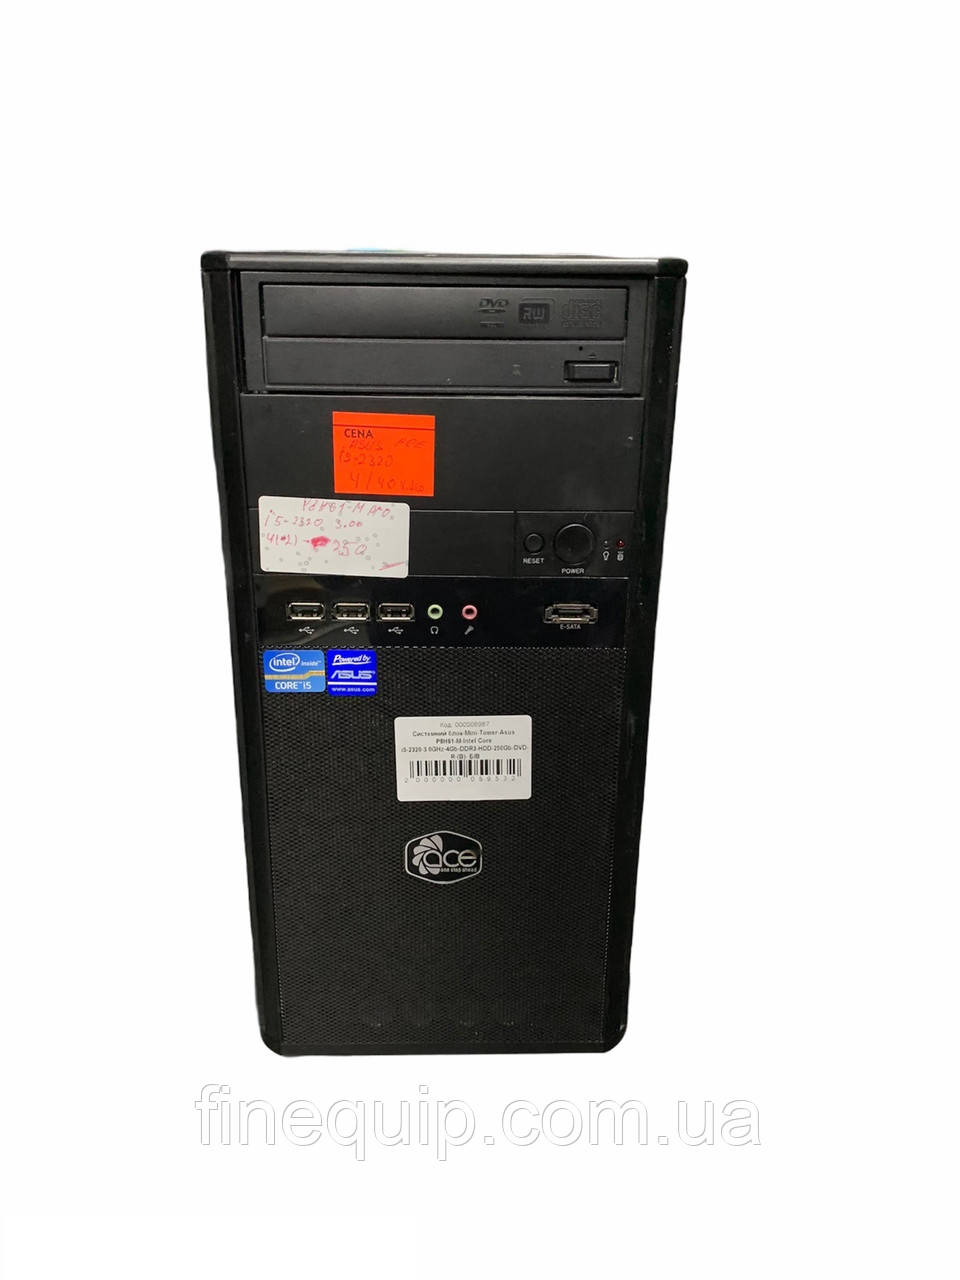 Системний блок mini tower-Asus P8H61-M-Intel Pentium G645-2.9GHz-4Gb-DDR3-HDD-250Gb-(B)- Б/В